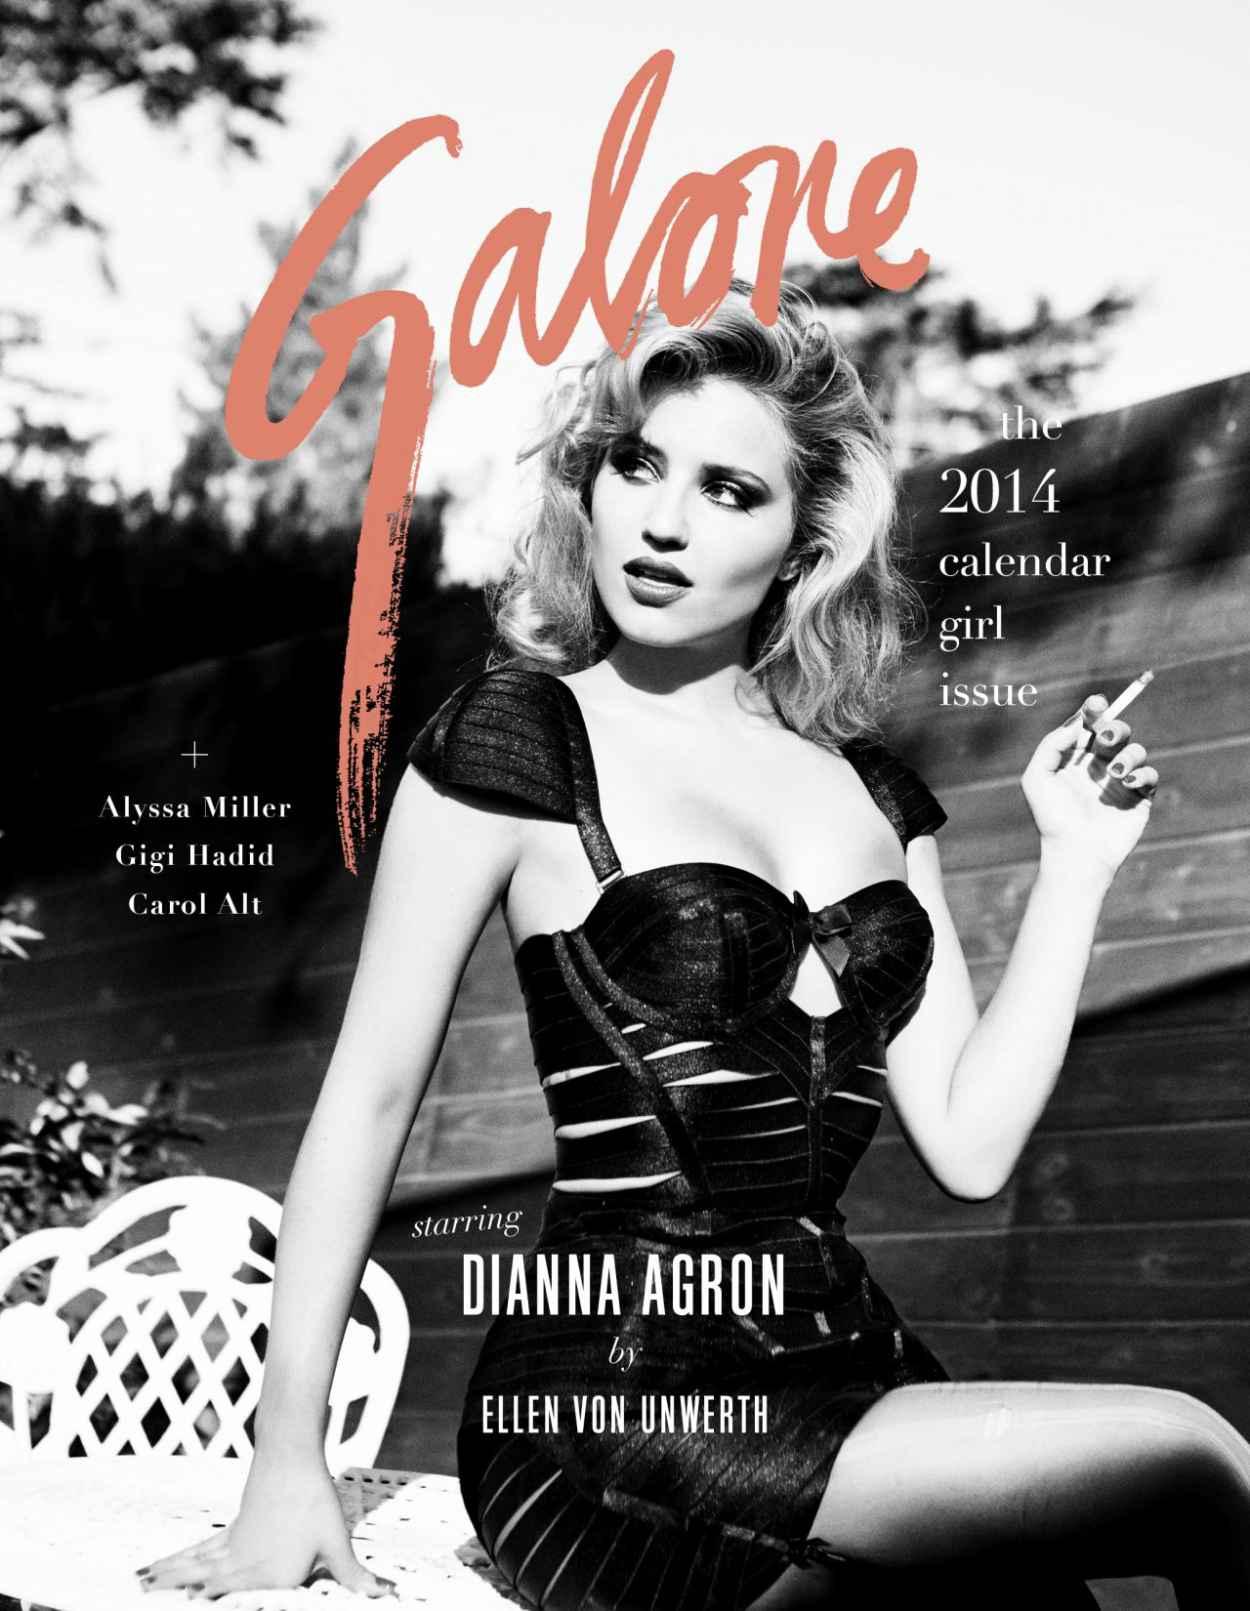 Dianna Agron - Photoshoot For GALORE Magazine-1